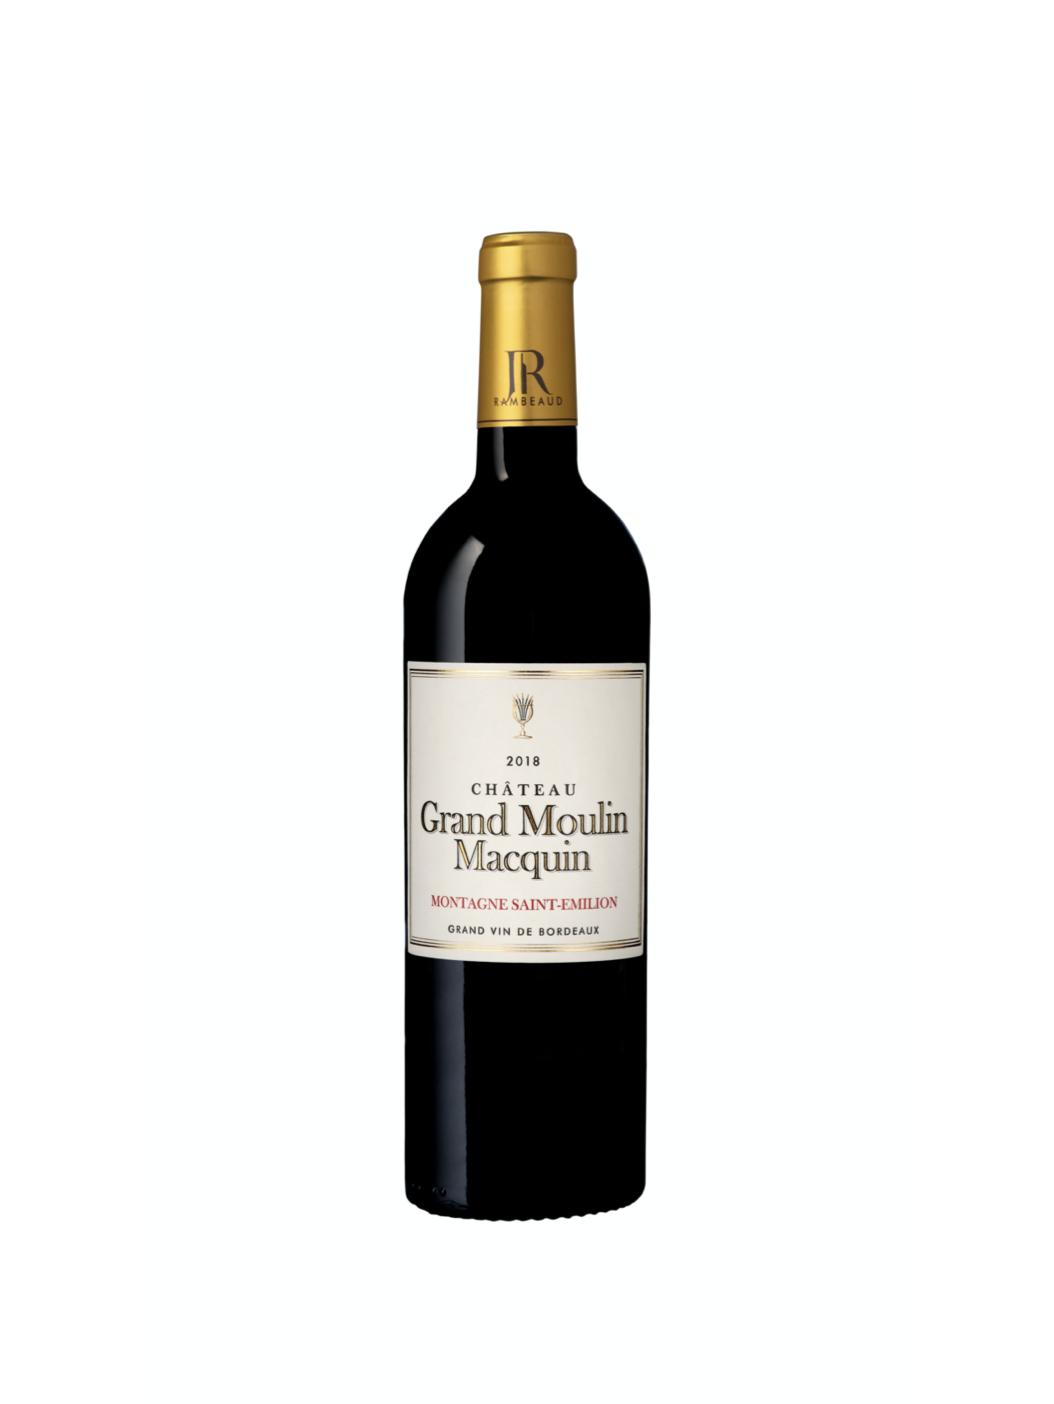 bouteille-vin-grand-moulin-macquin